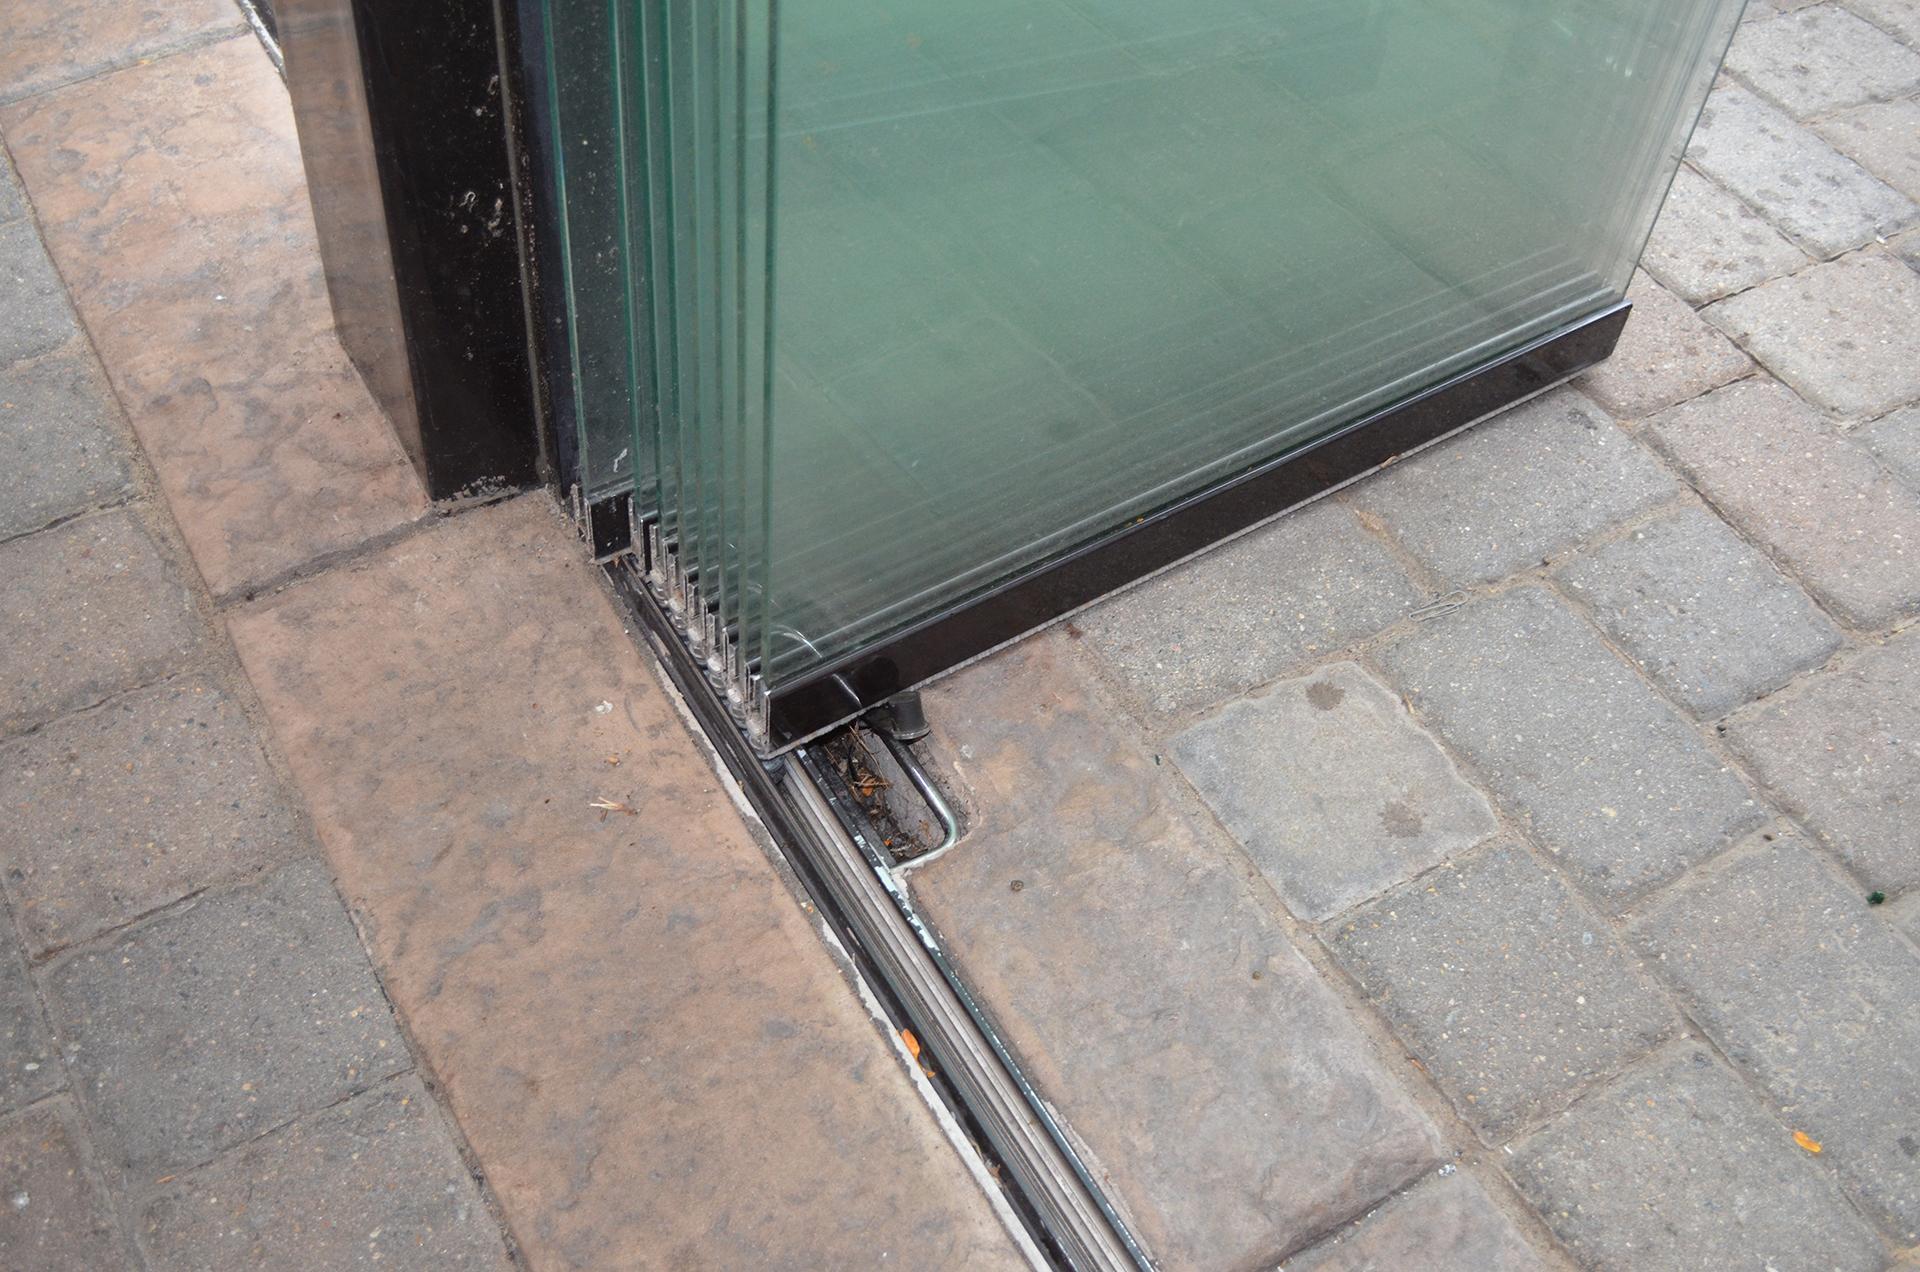 Frameless glass walls stacked